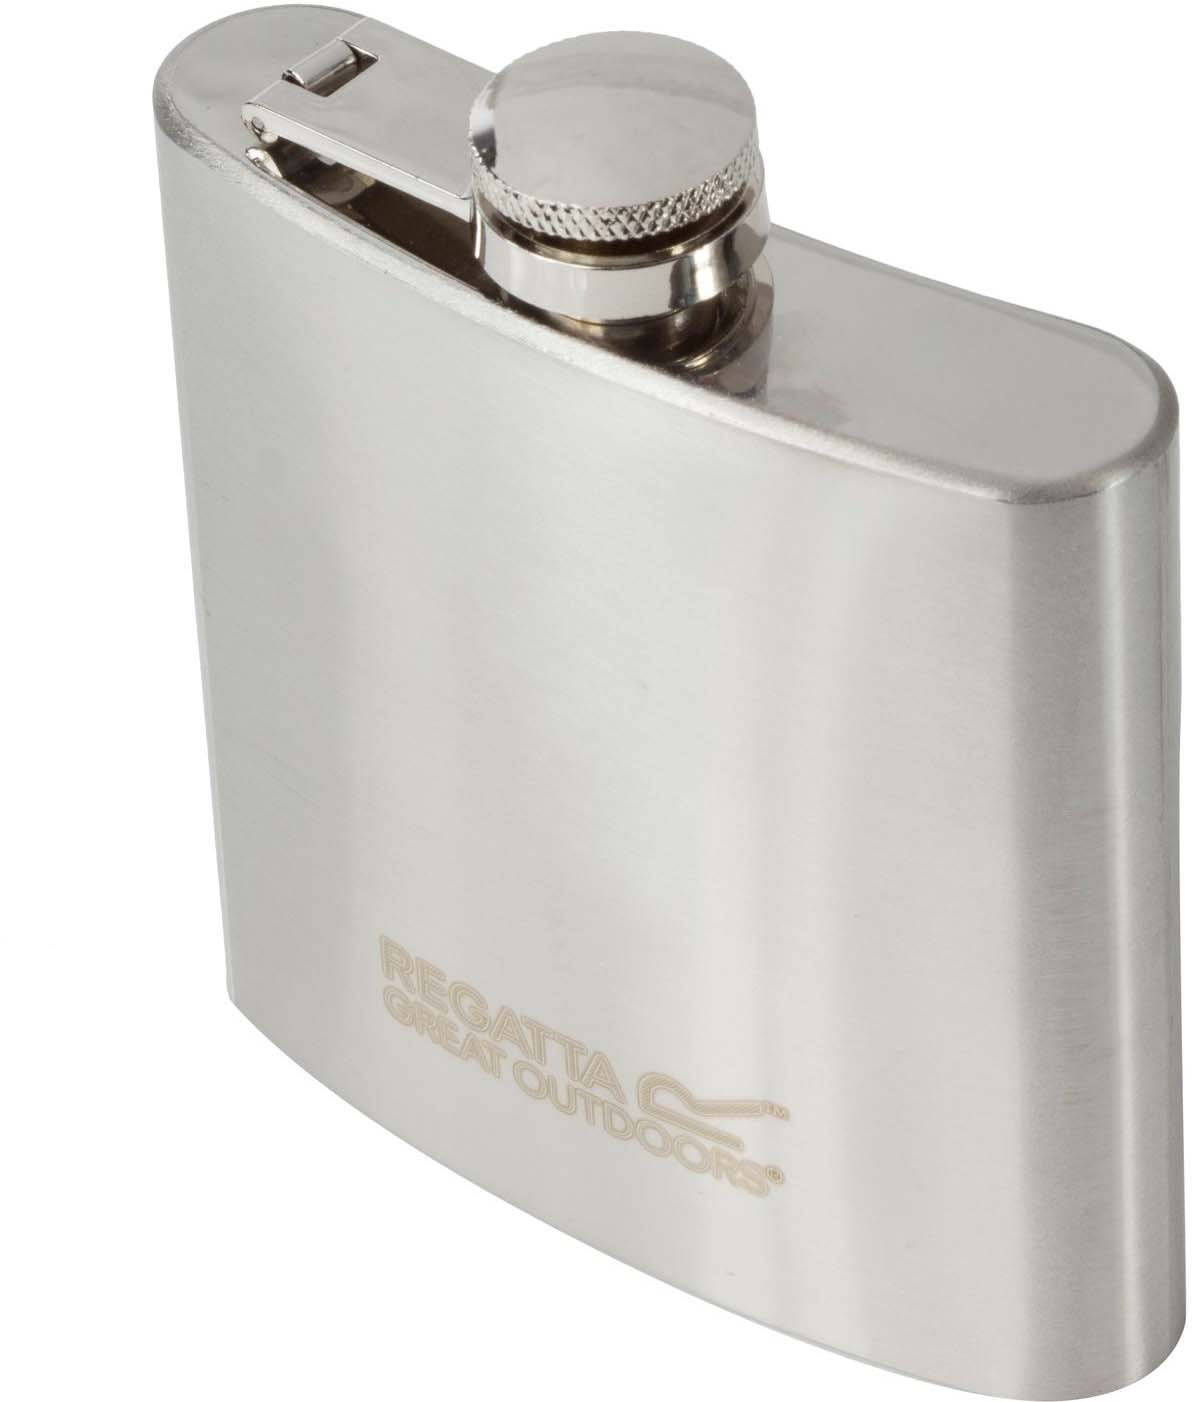 Фляга спортивная Regatta Hip Flask. цвет: серый, 170 мл